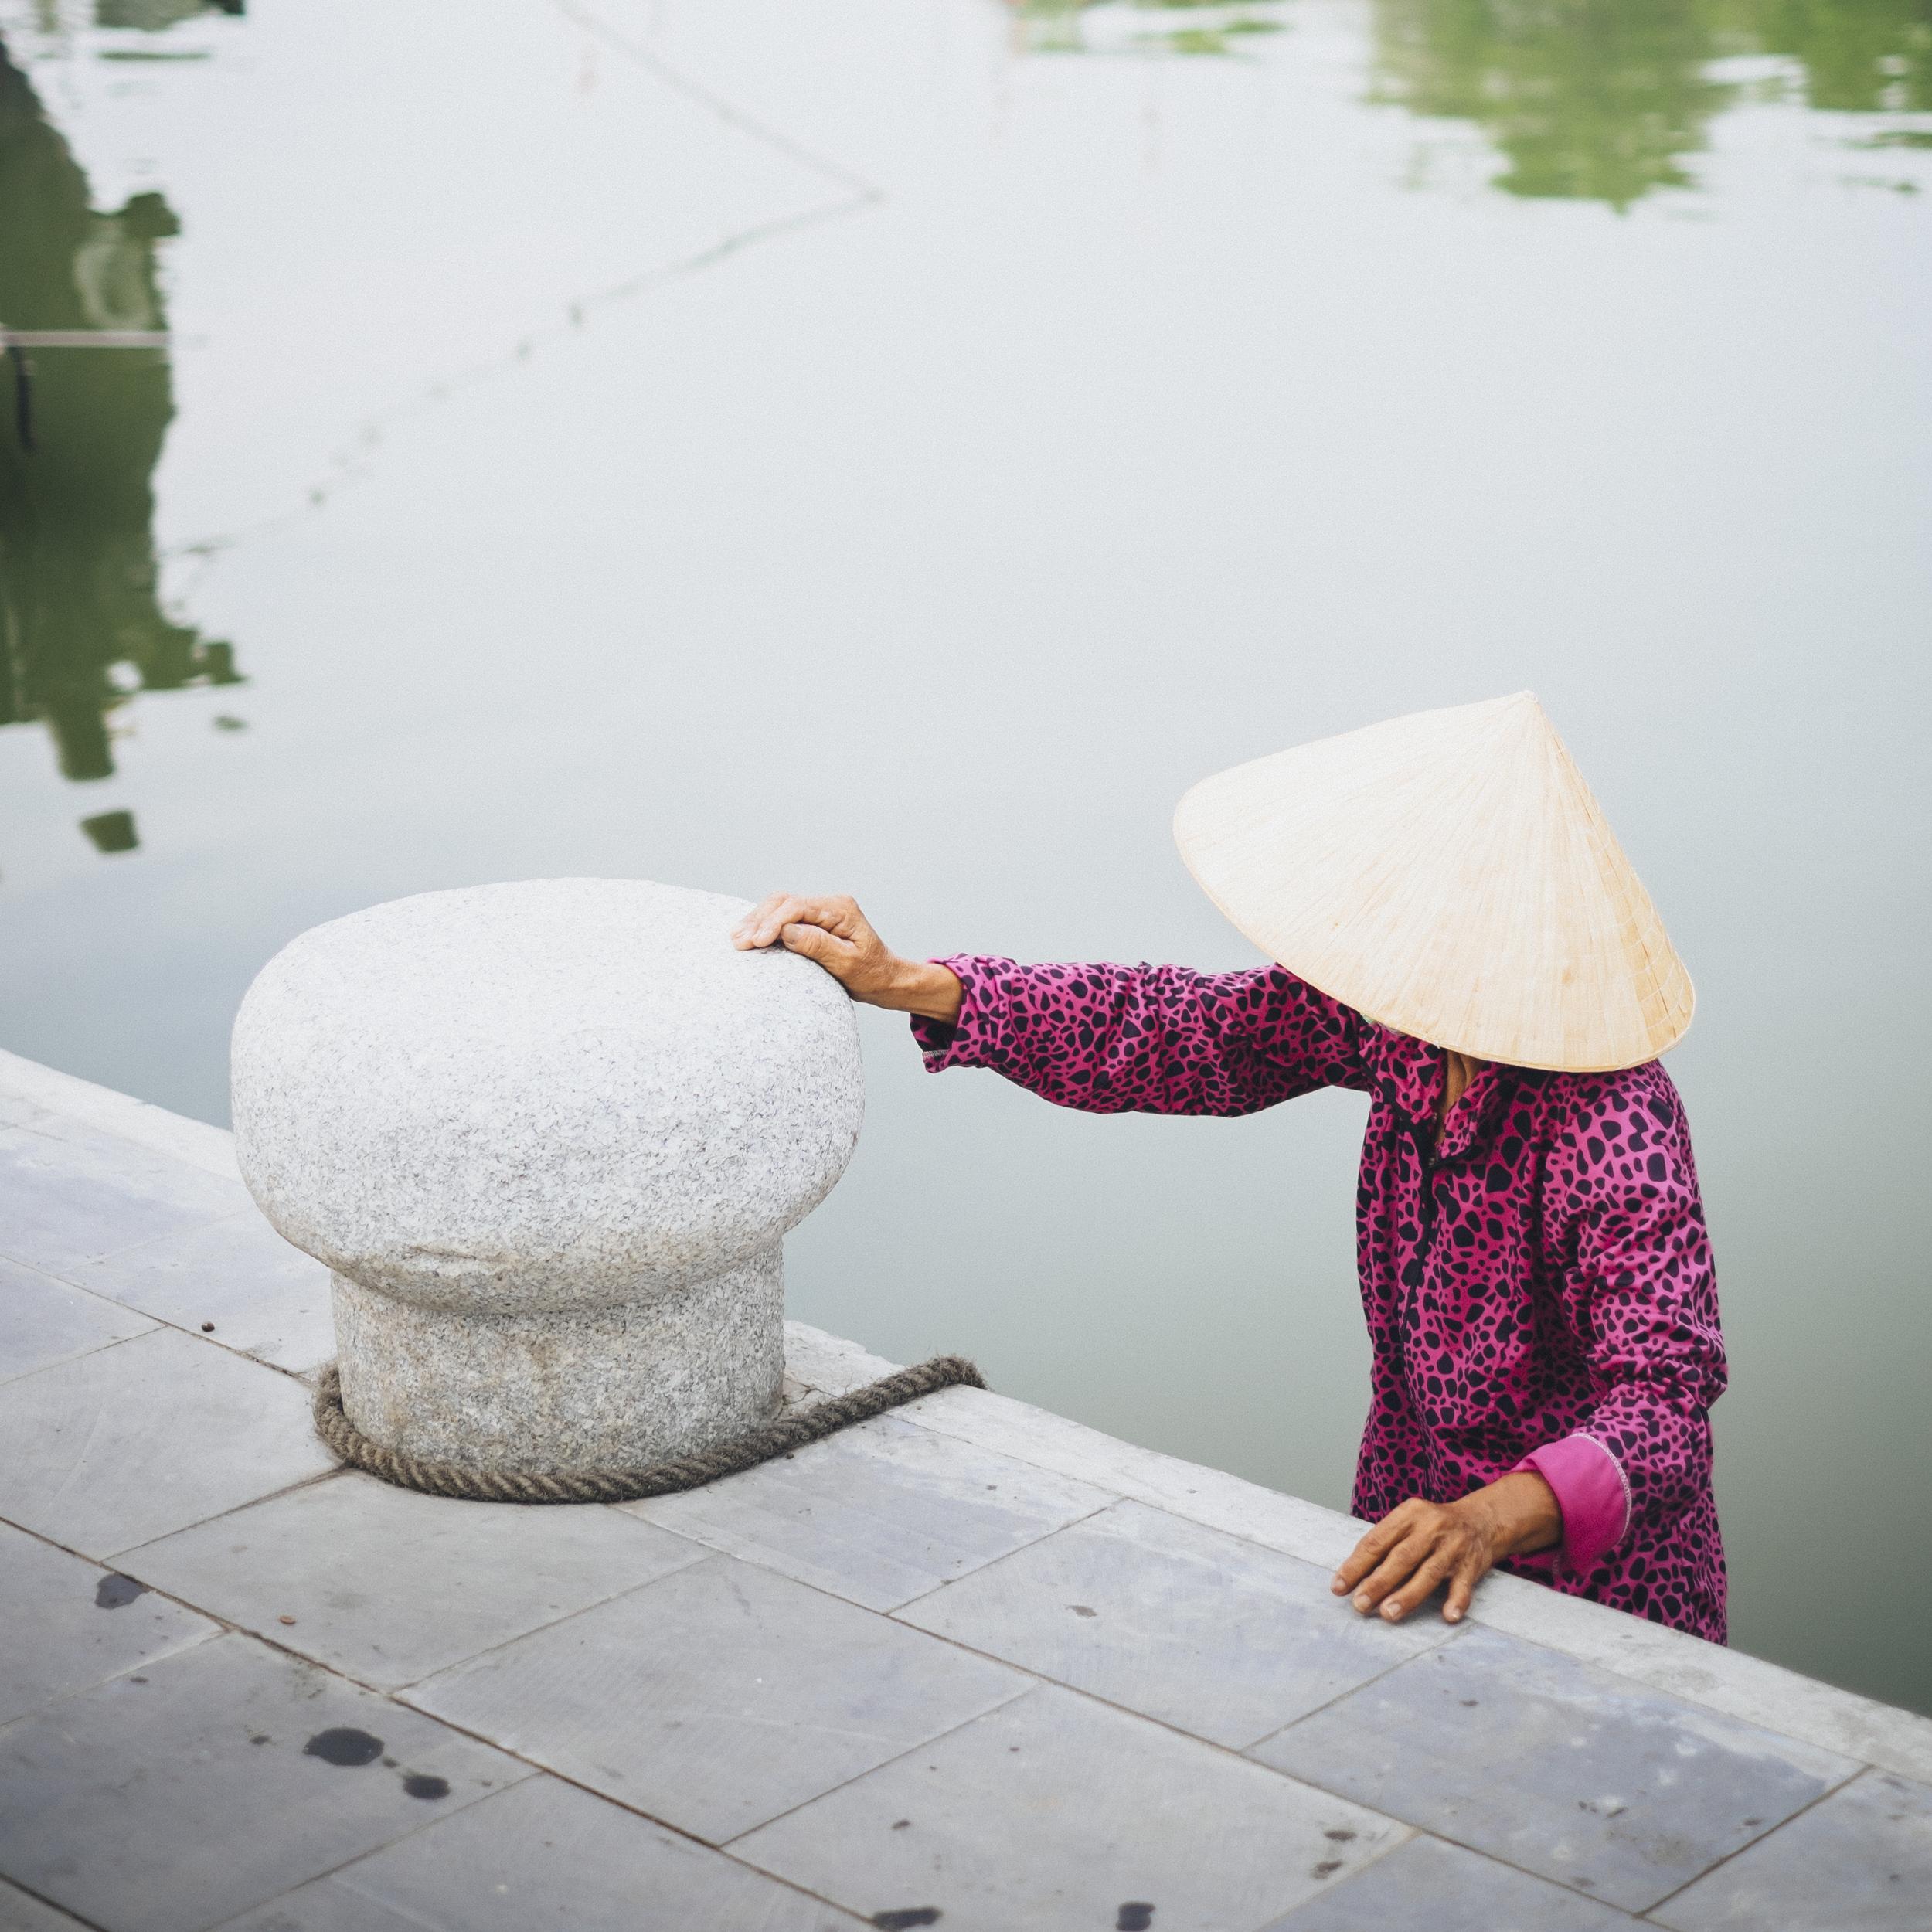 Vietnam-0589.jpg